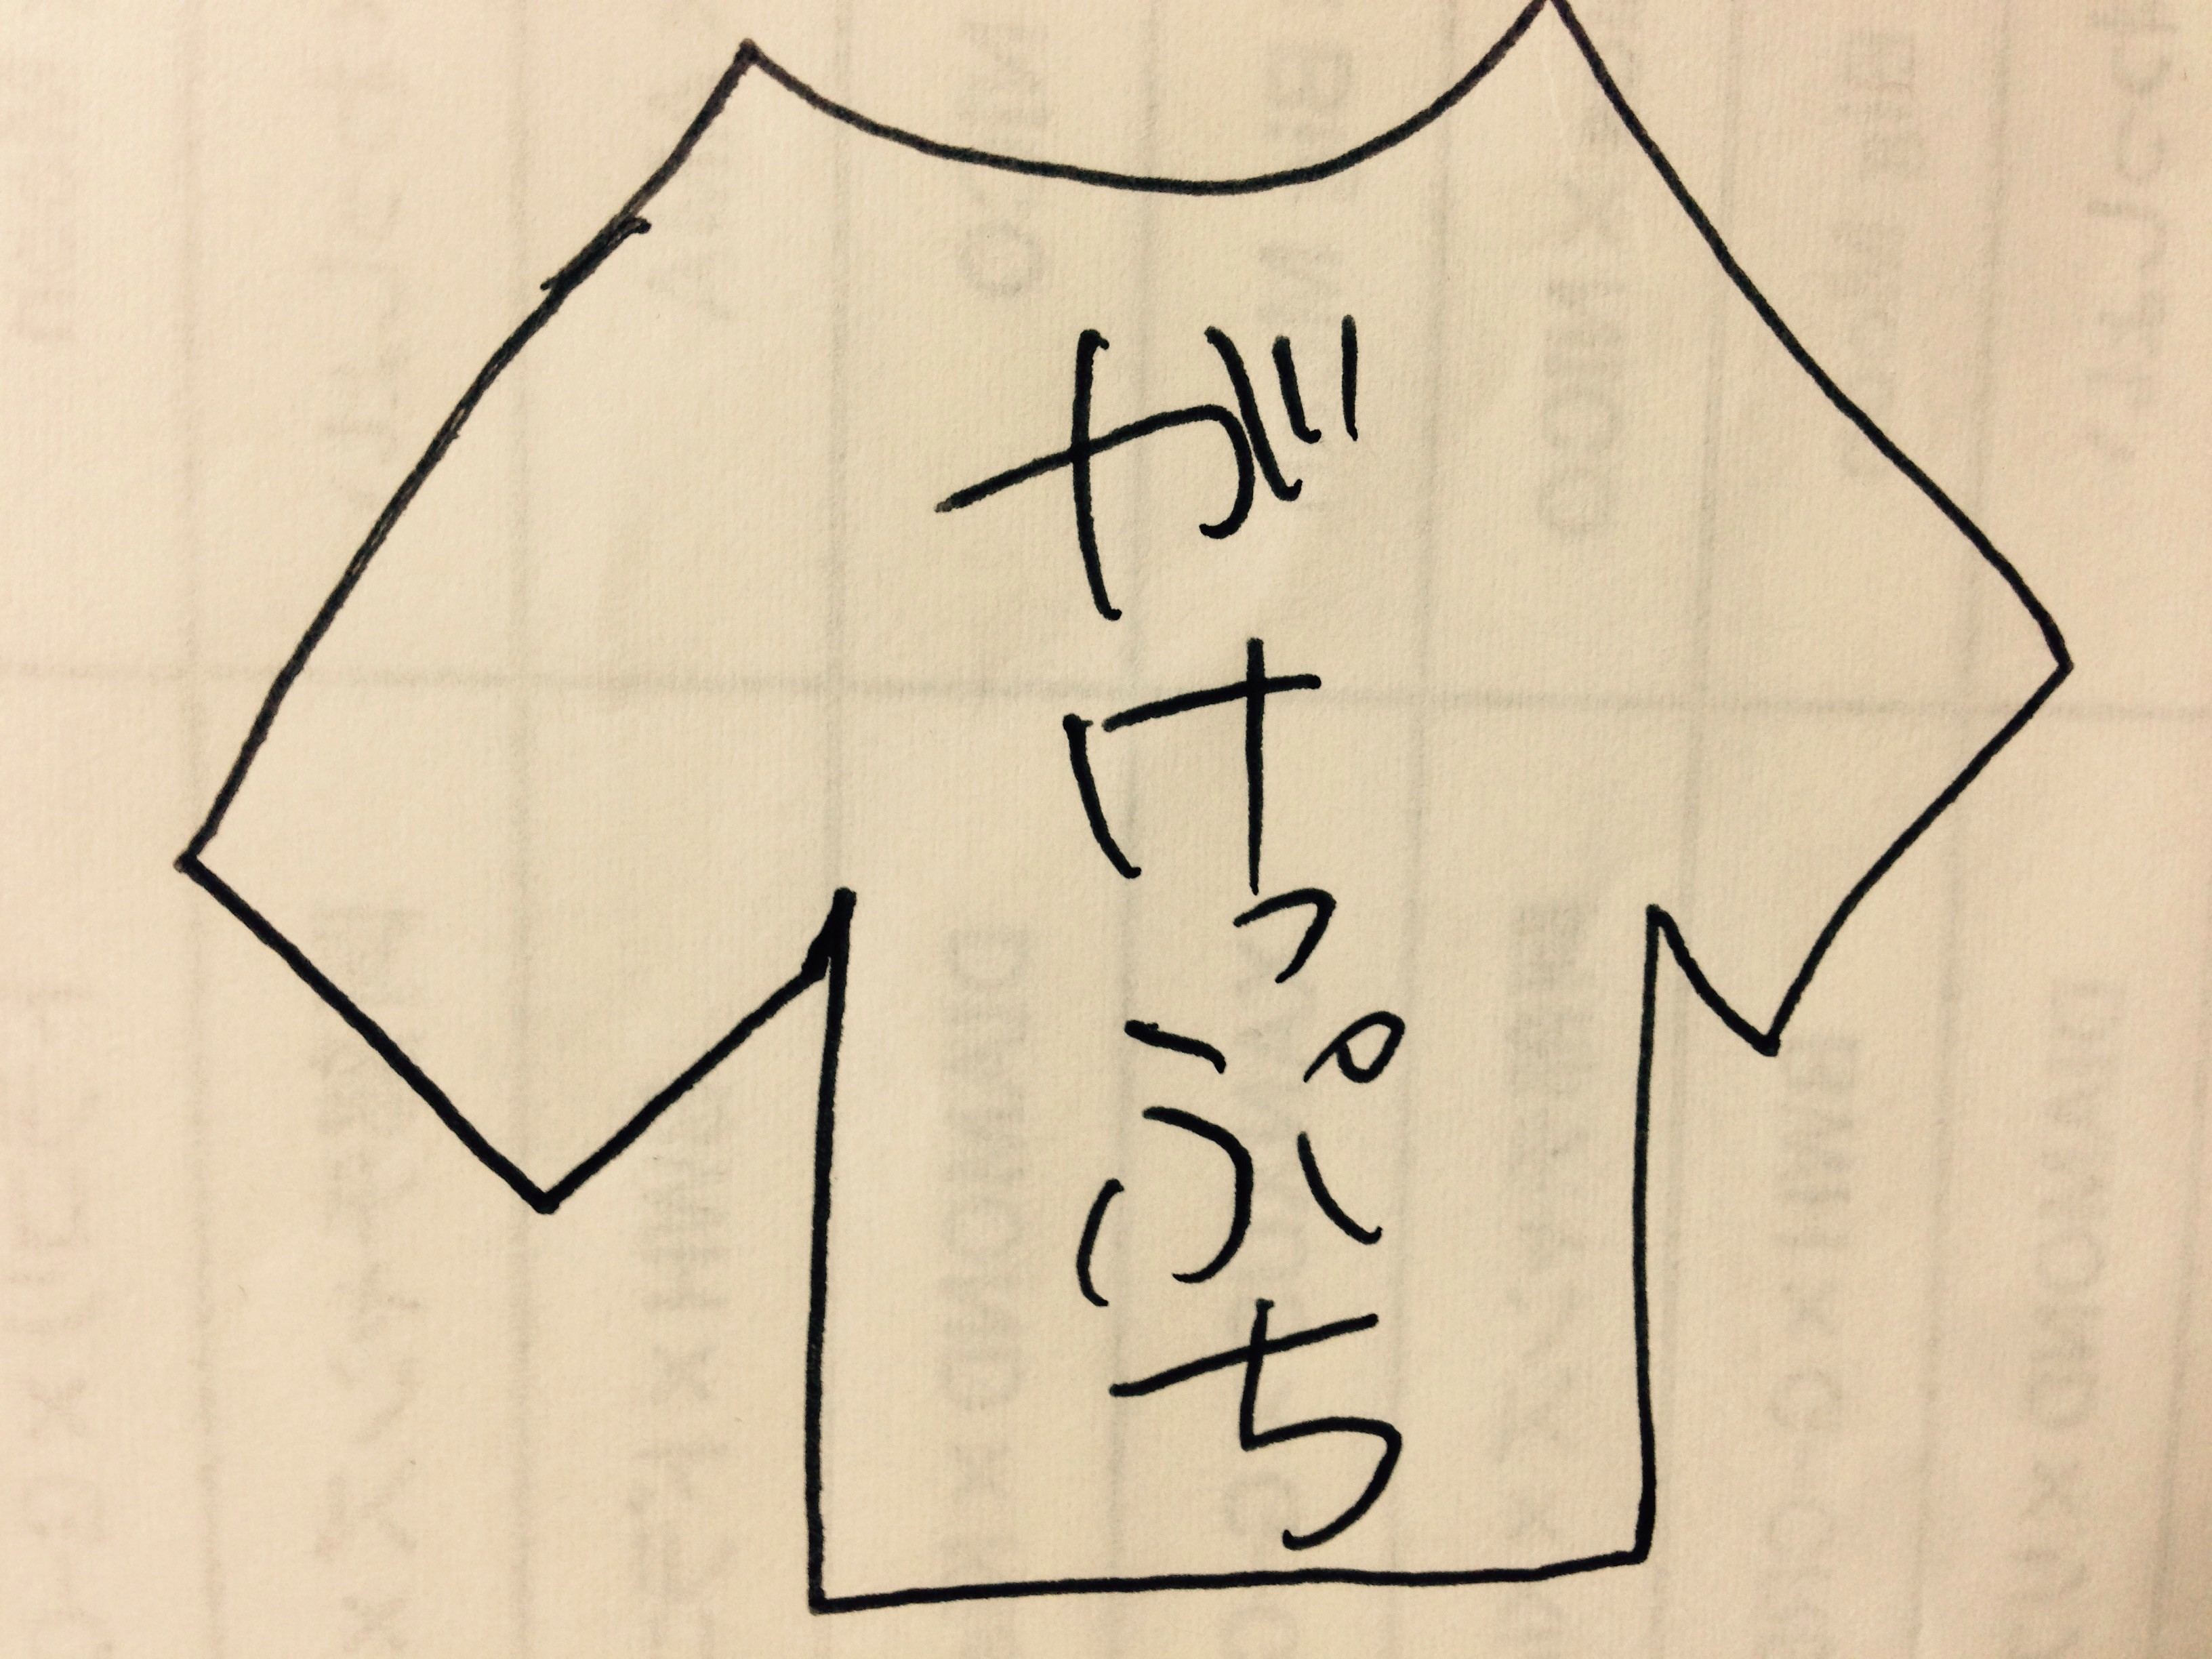 Tシャツを作ろうの会